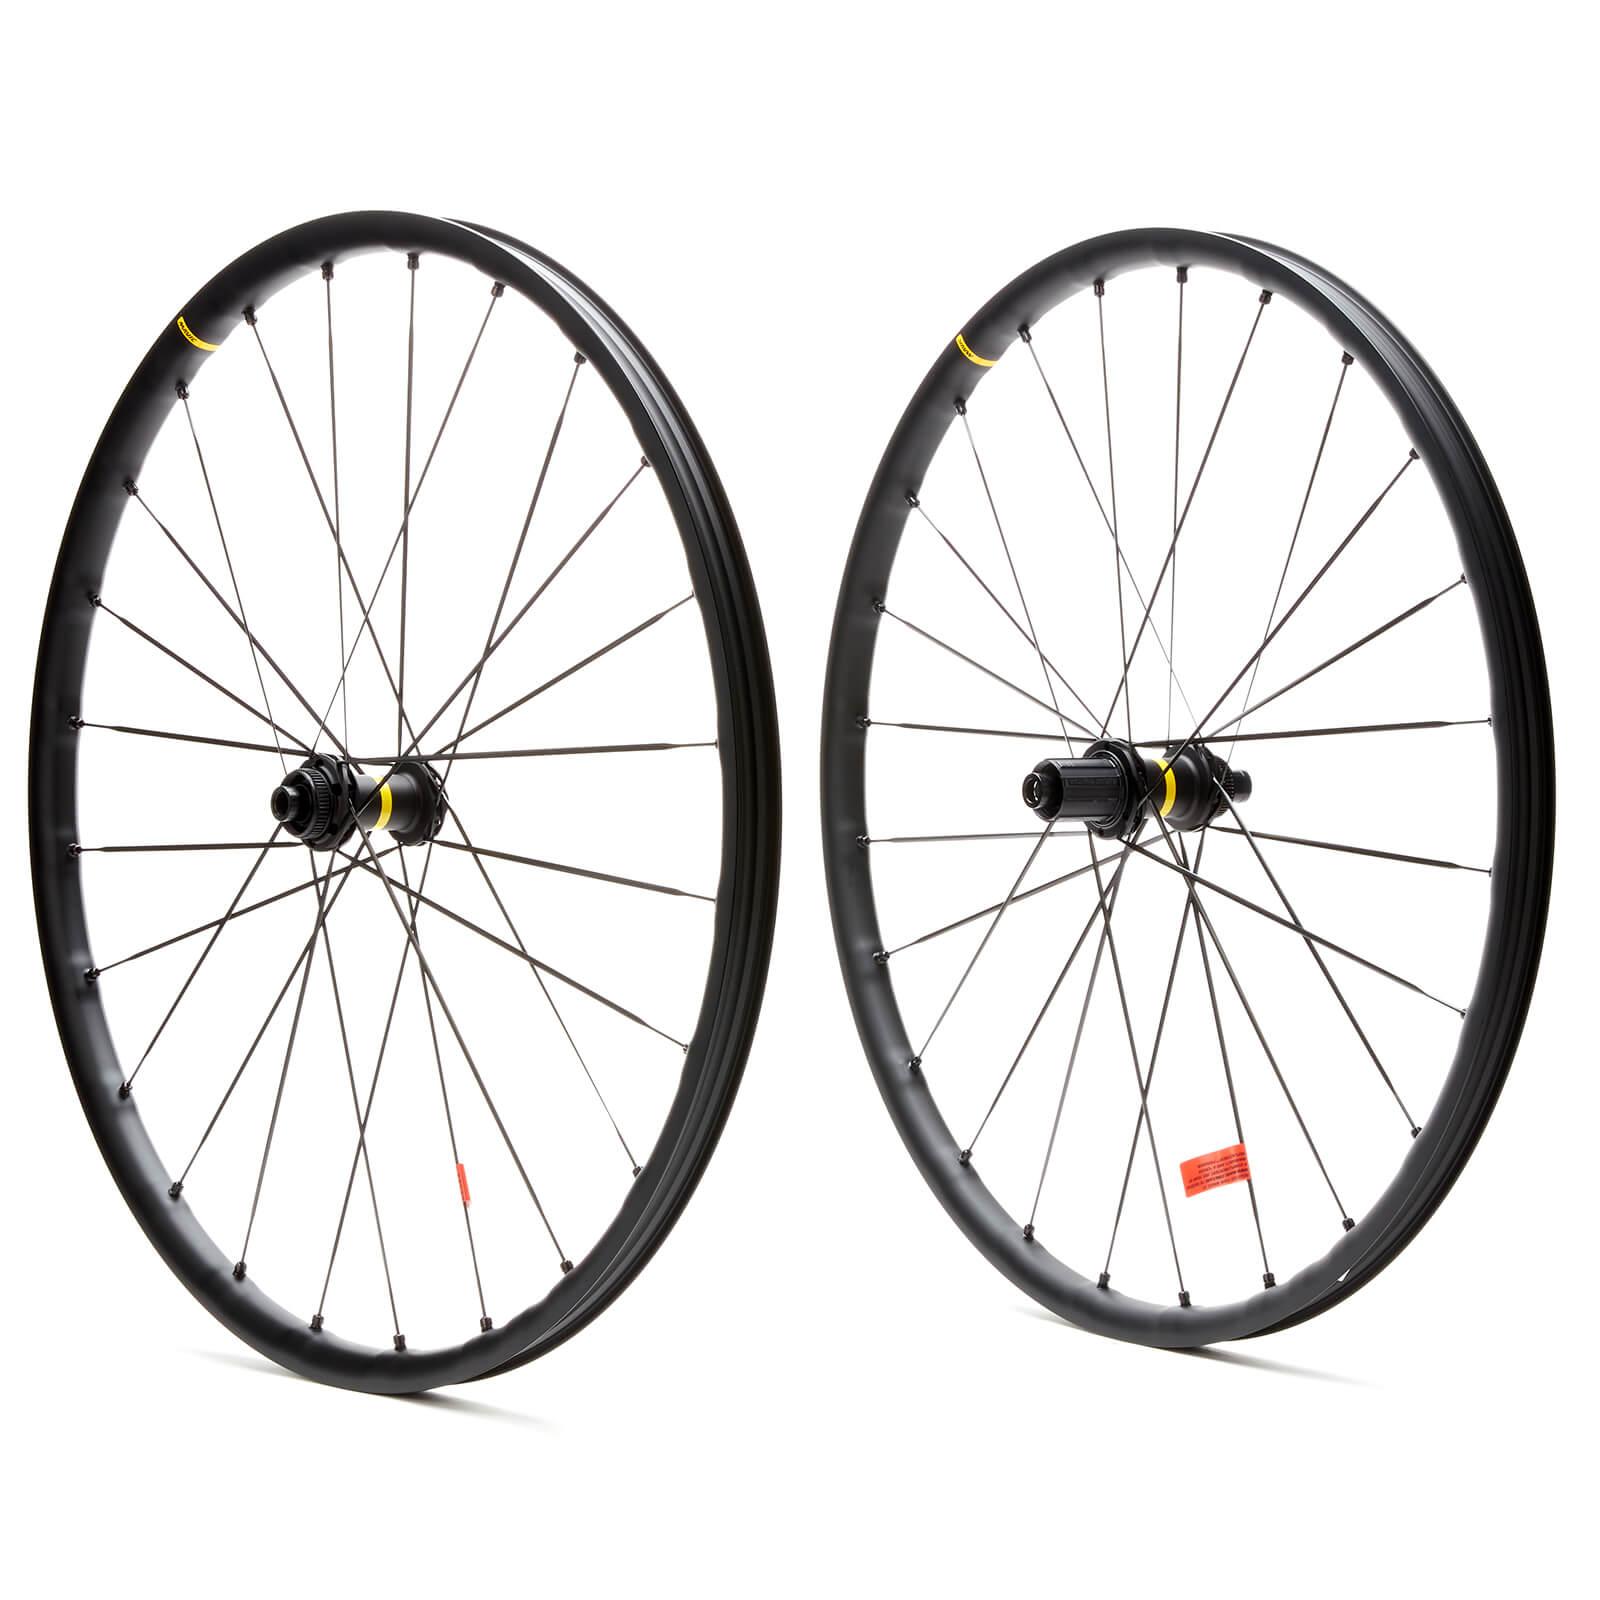 Mavic Allroad Sl Road+ Disc Wheelset - 2021 - Xd-r